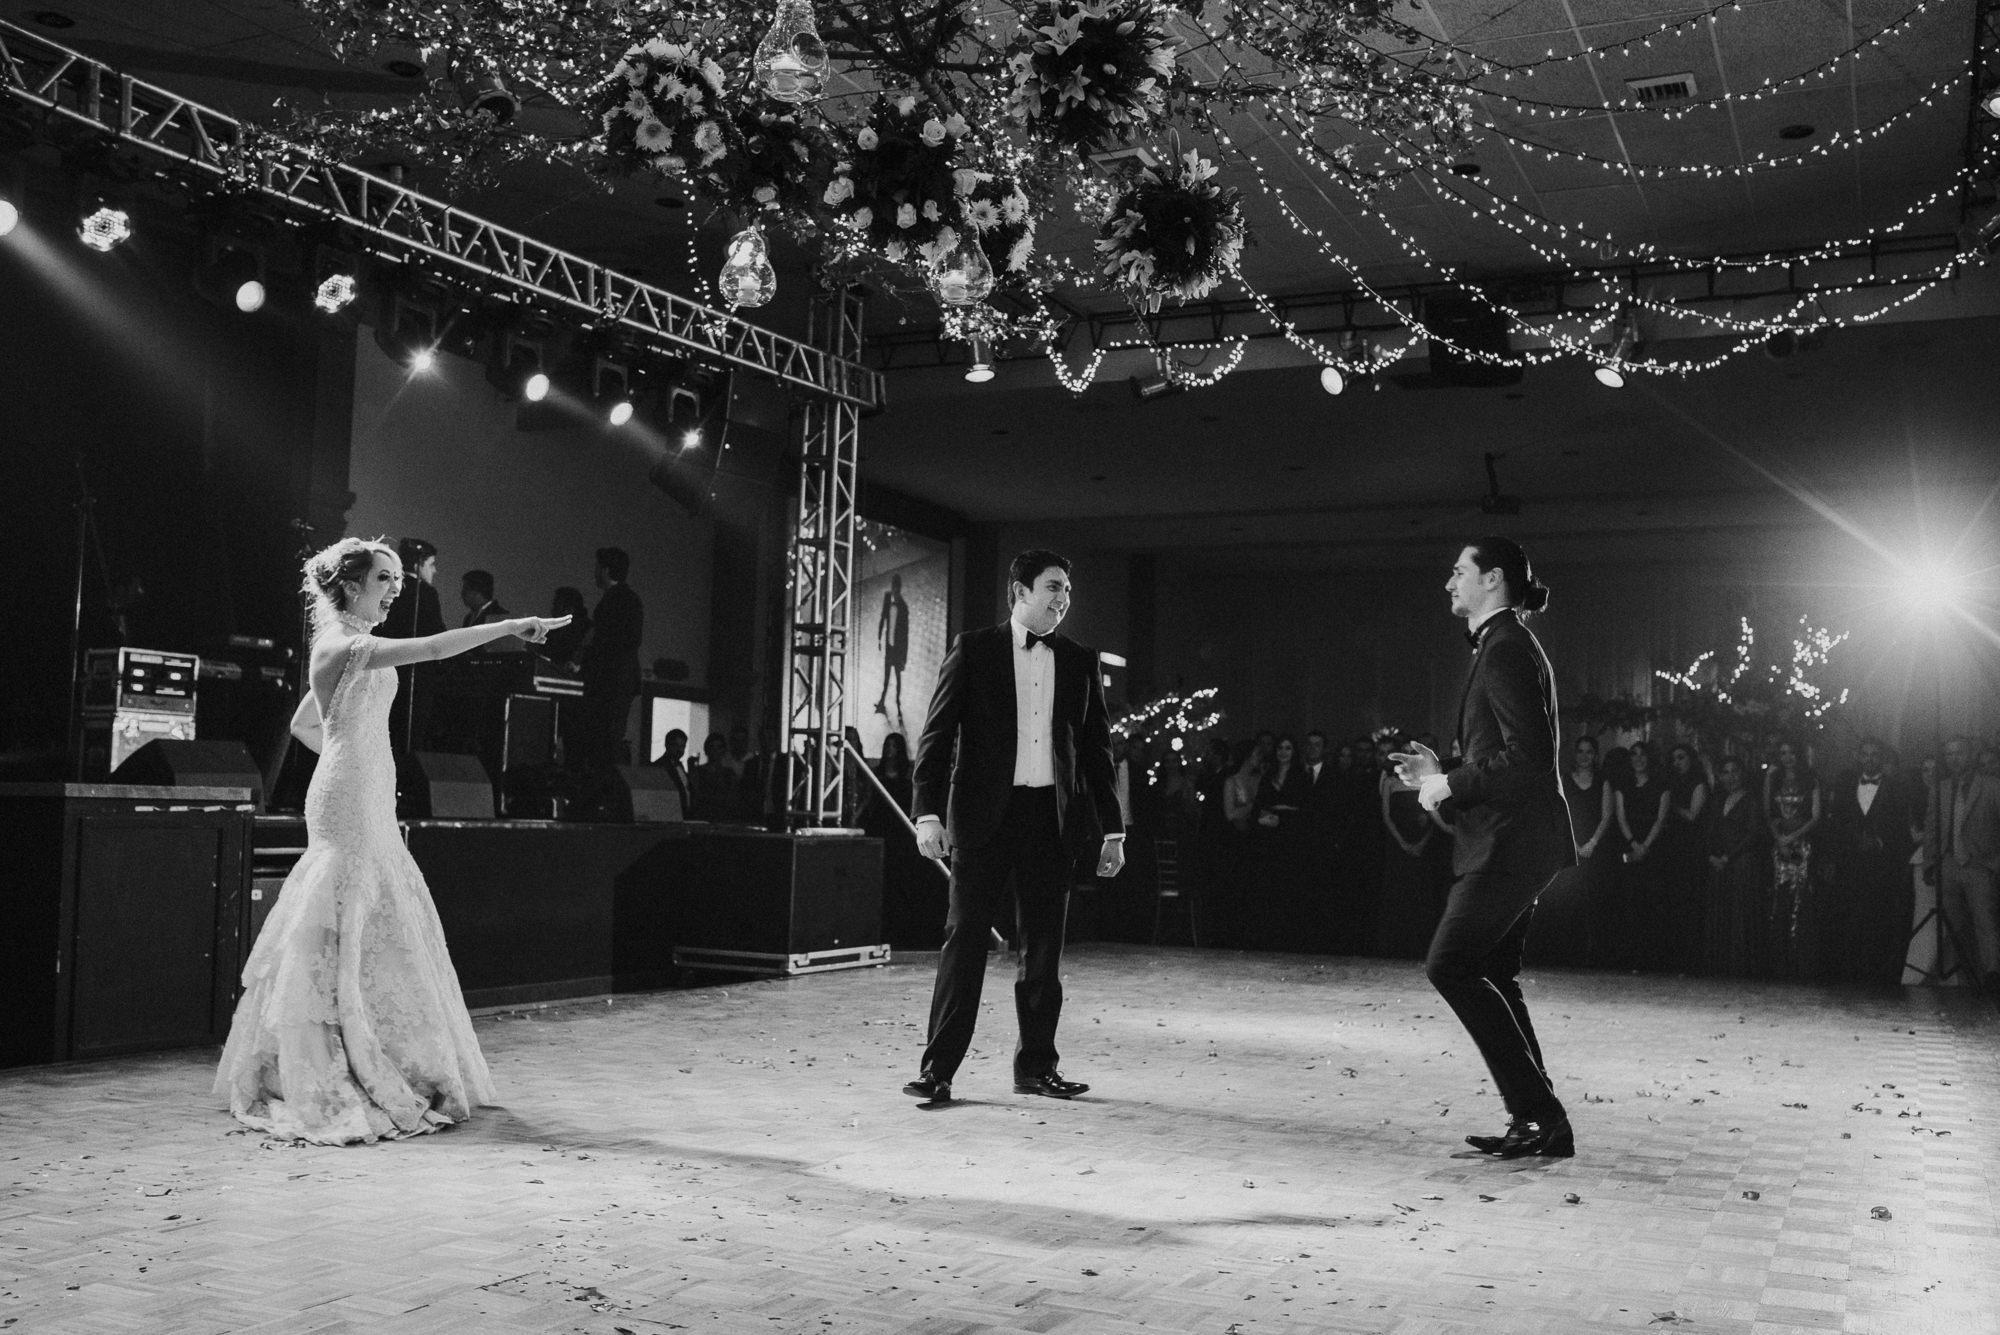 Mario-Karla-Wedding-279